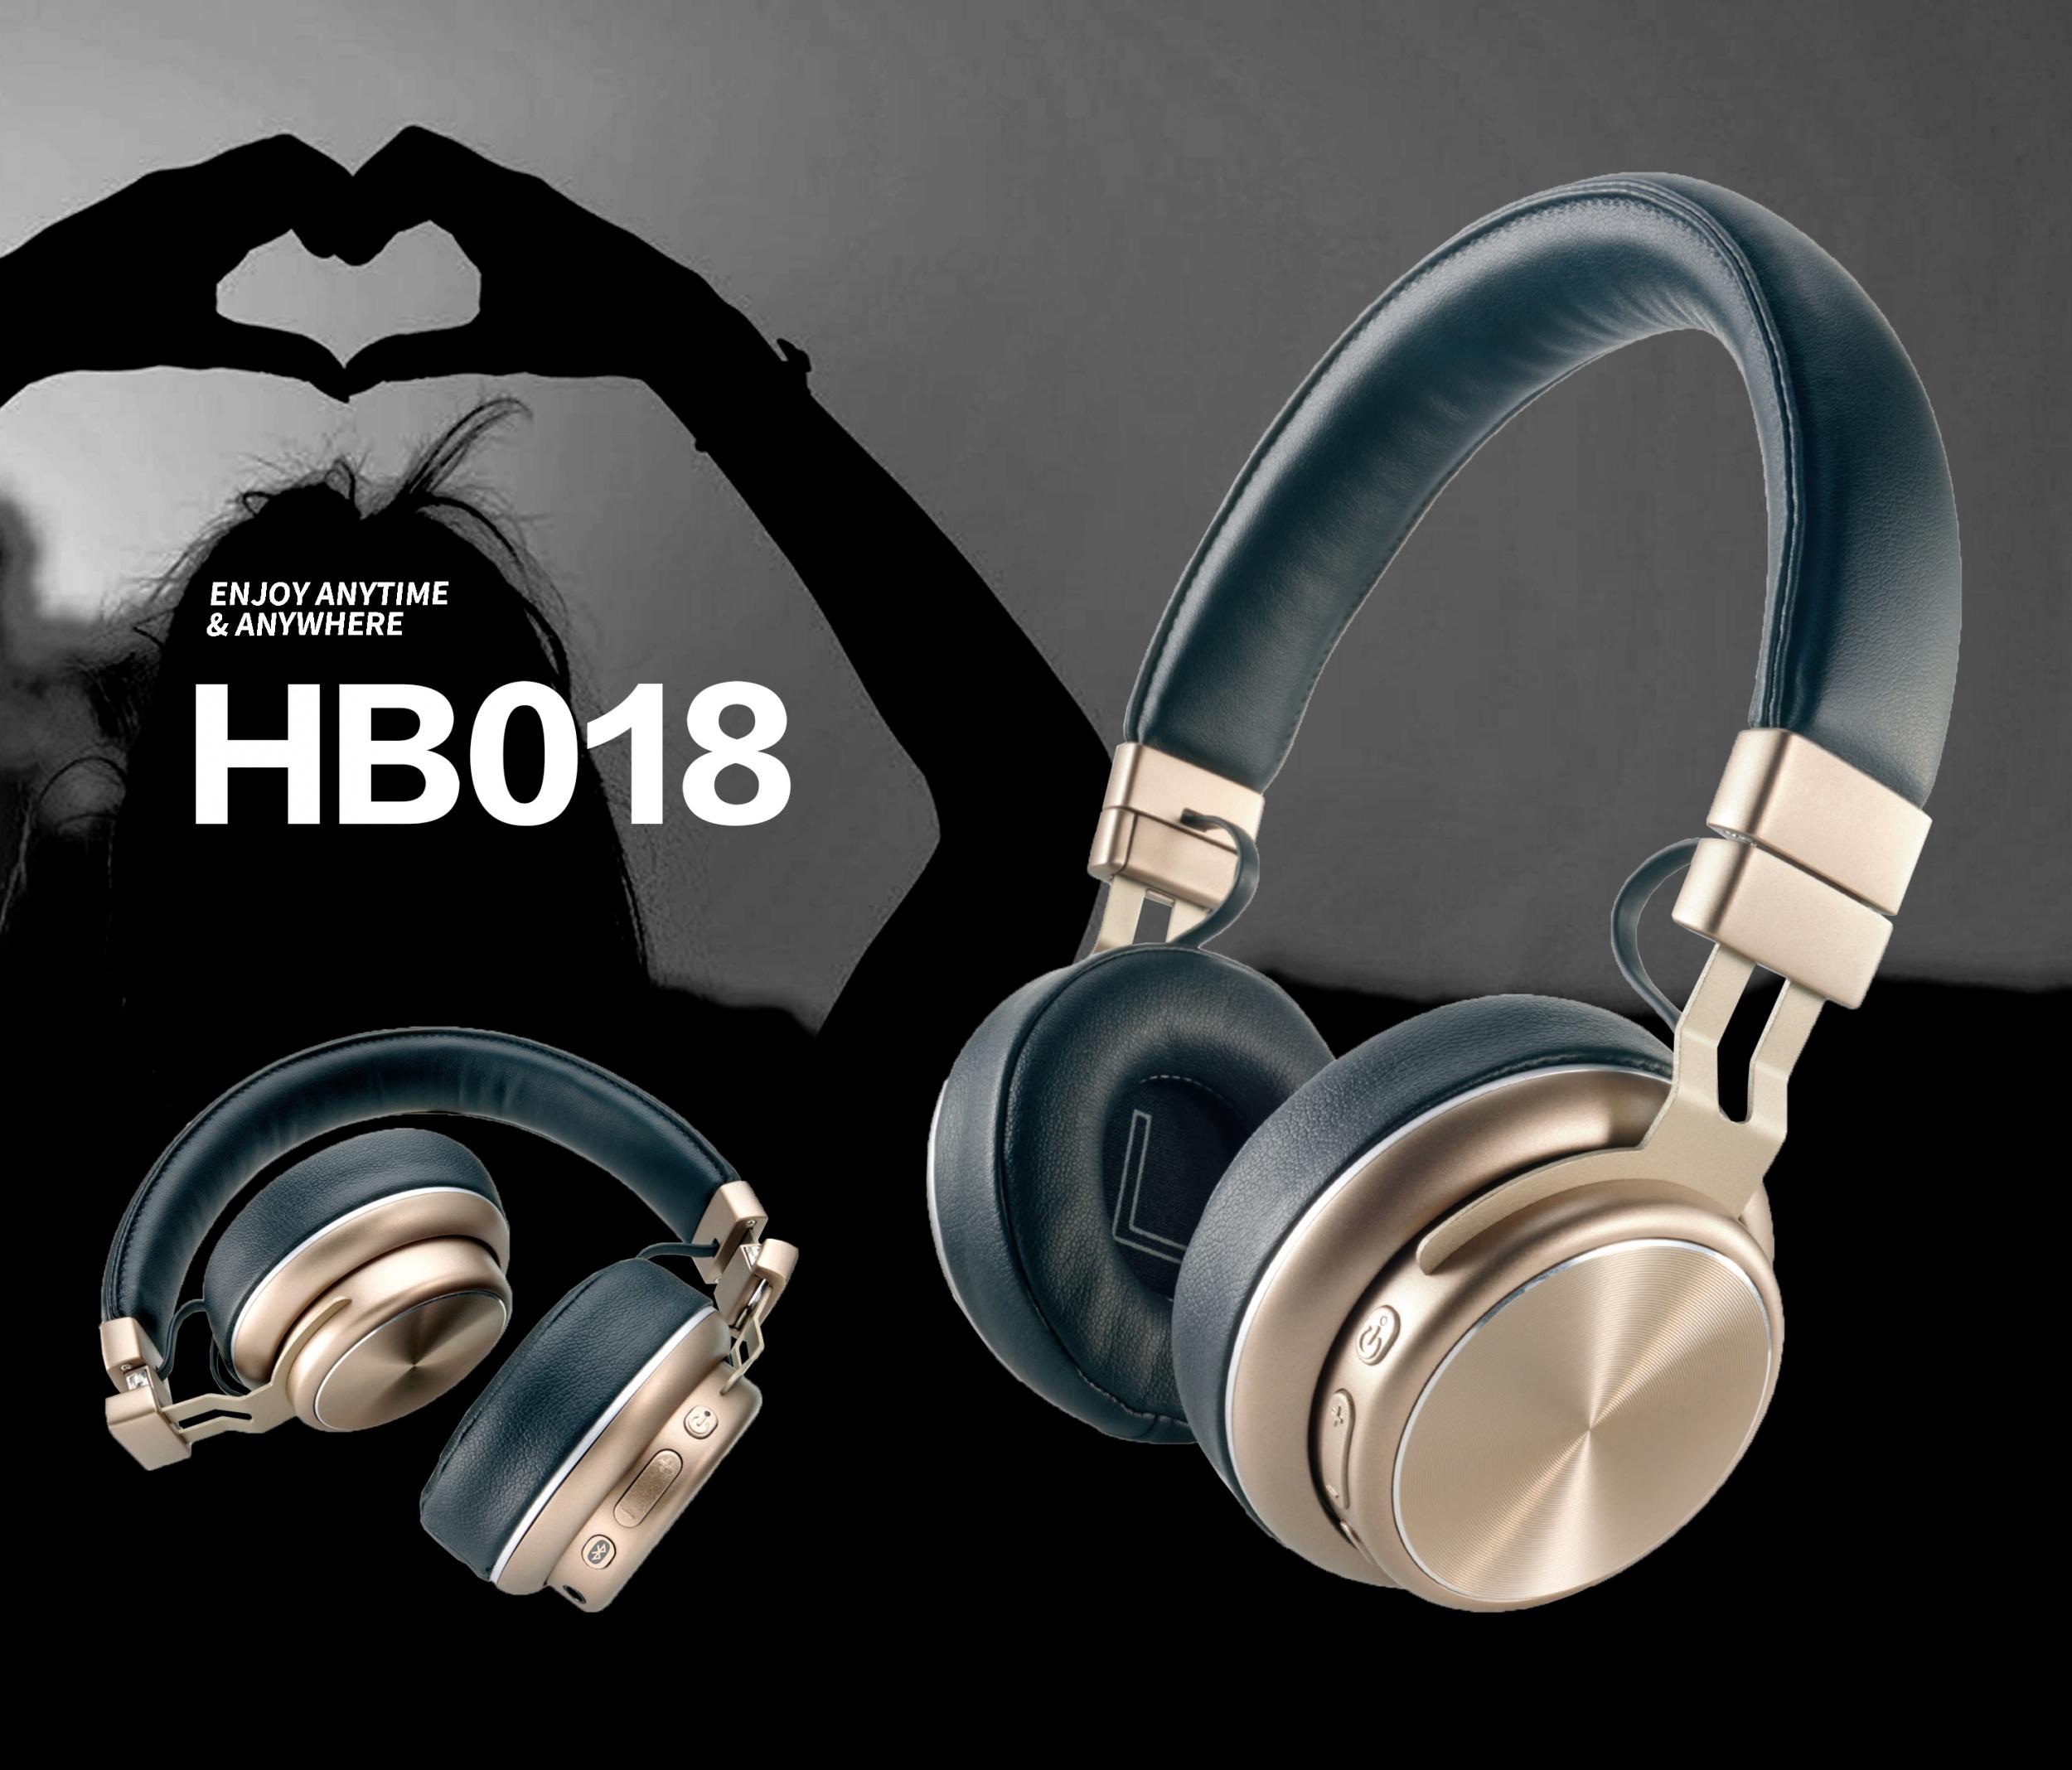 HB018